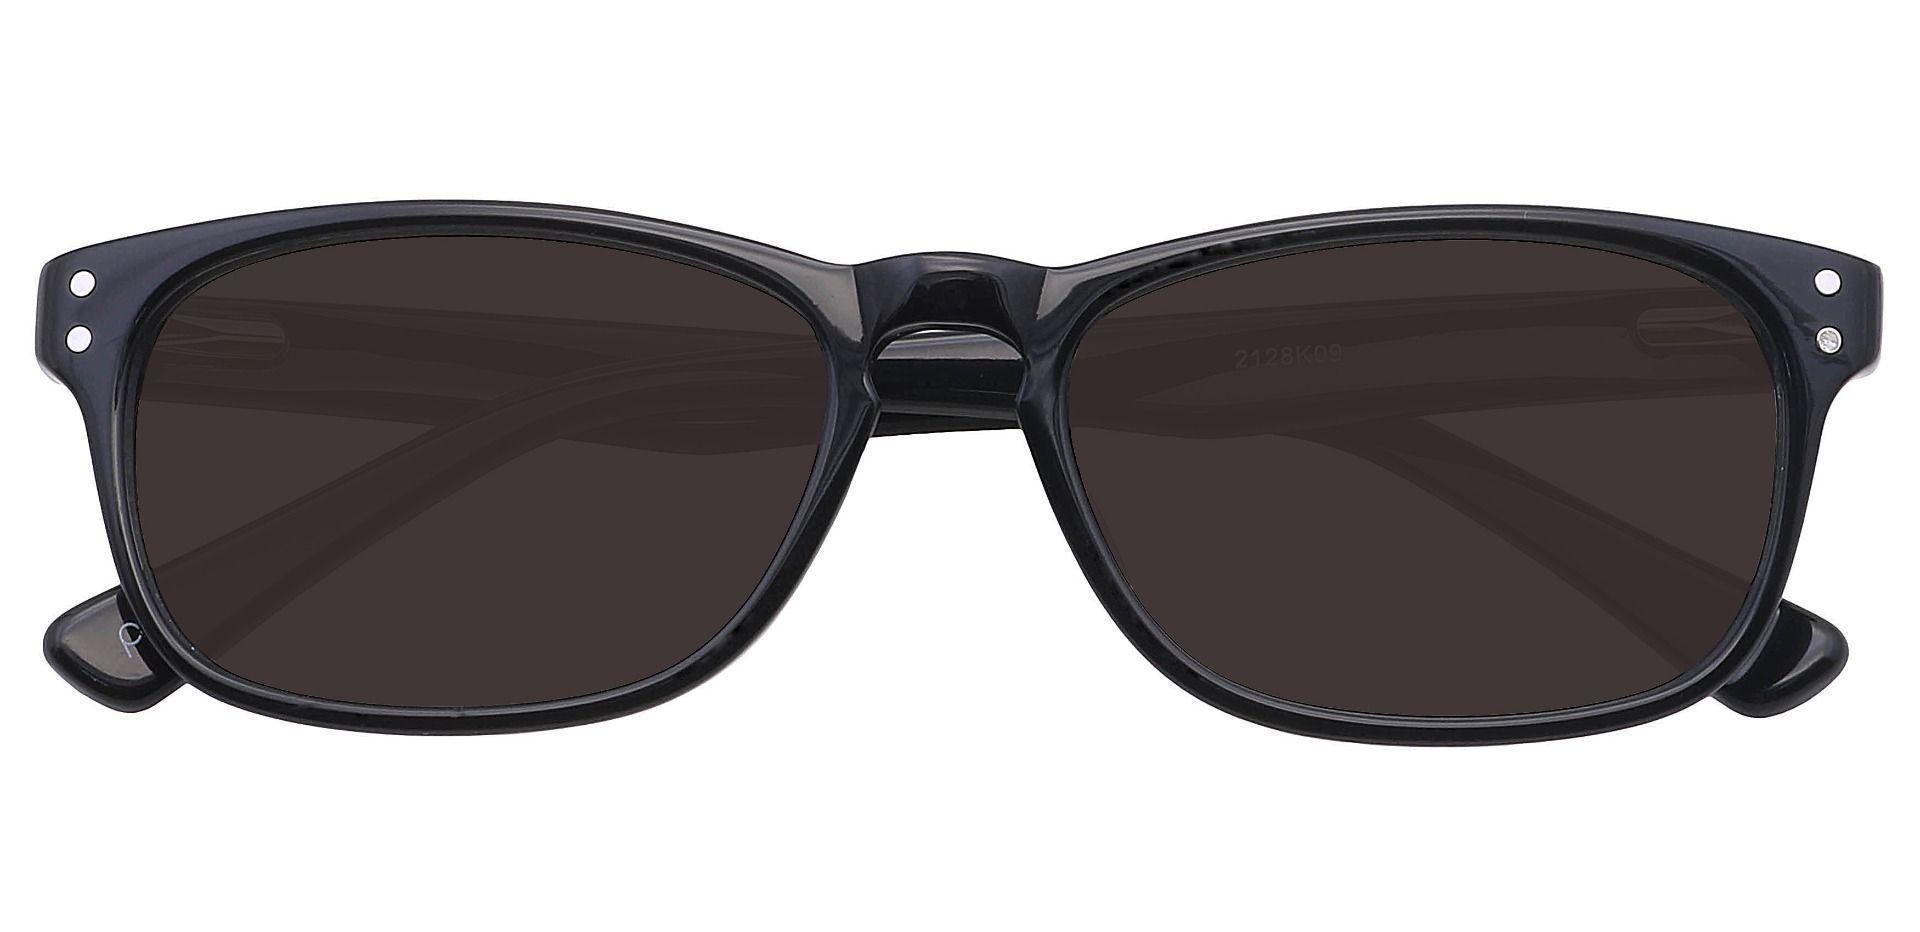 Morris Rectangle Lined Bifocal Sunglasses - Black Frame With Gray Lenses